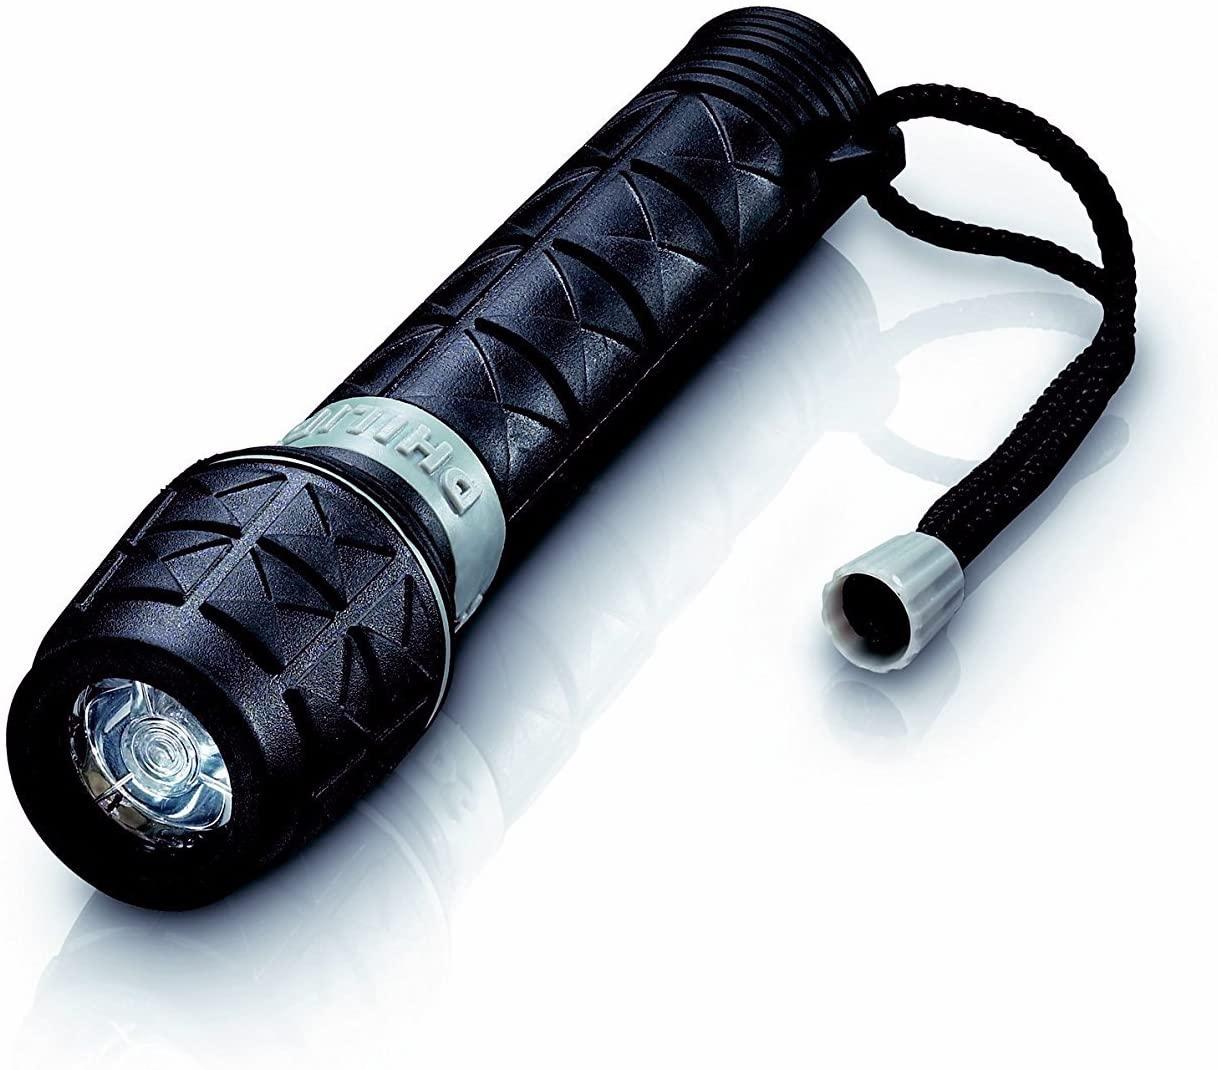 Philips-Flashlight-Rubber-LED-SFL5200-10